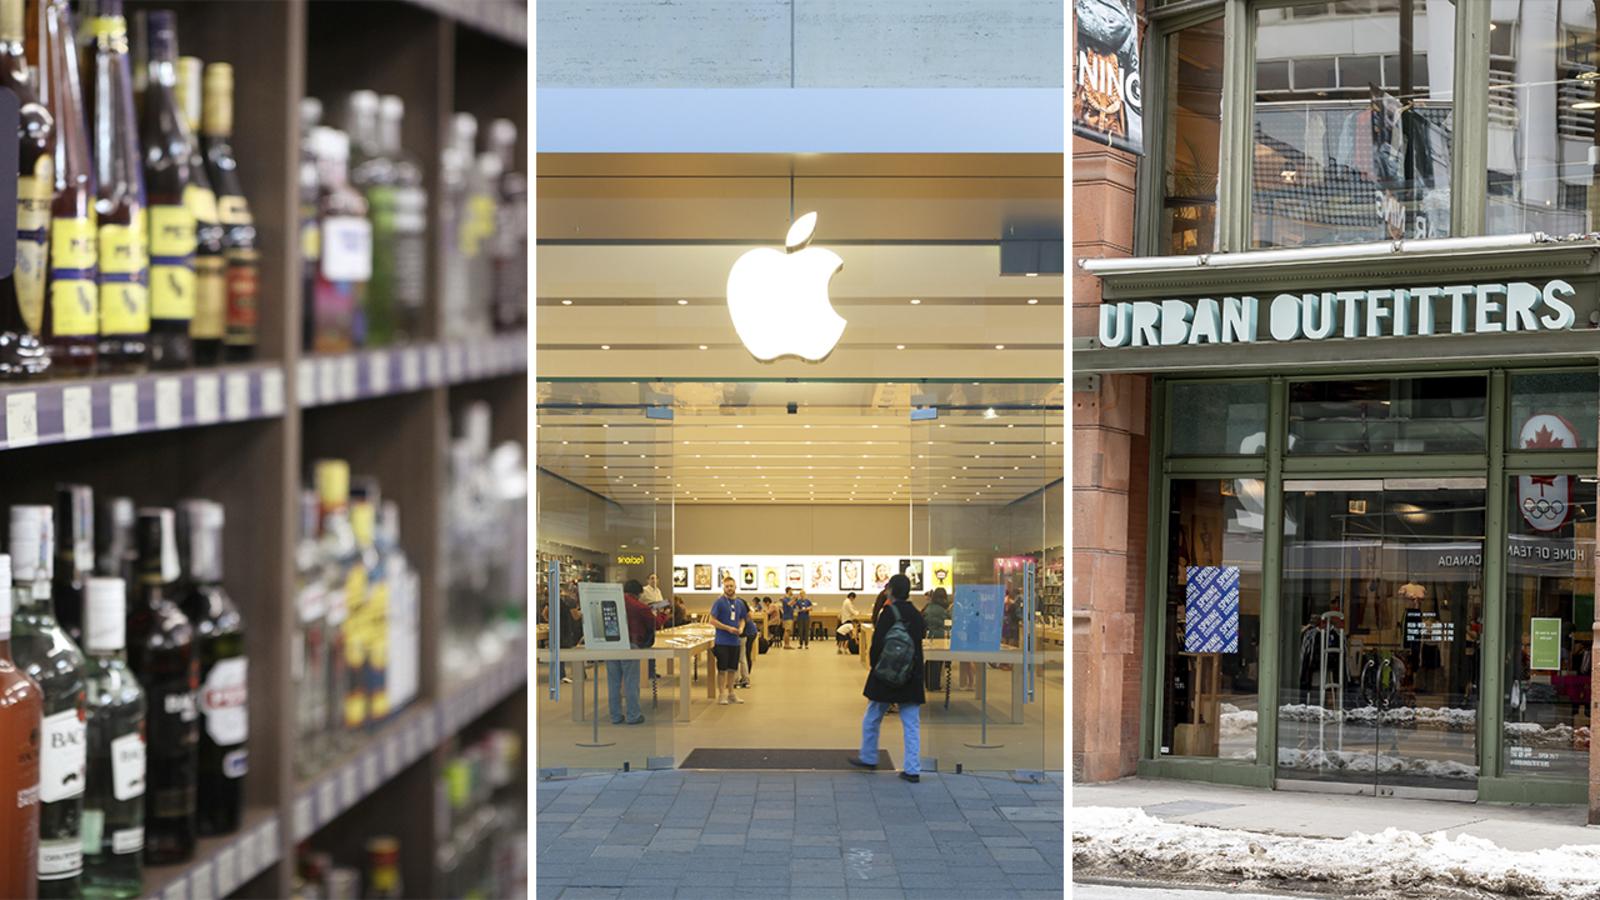 Coronavirus closures: Apple stores, Urban Outfitters, Pennsylvania liquor stores close to promote social distancing -TV